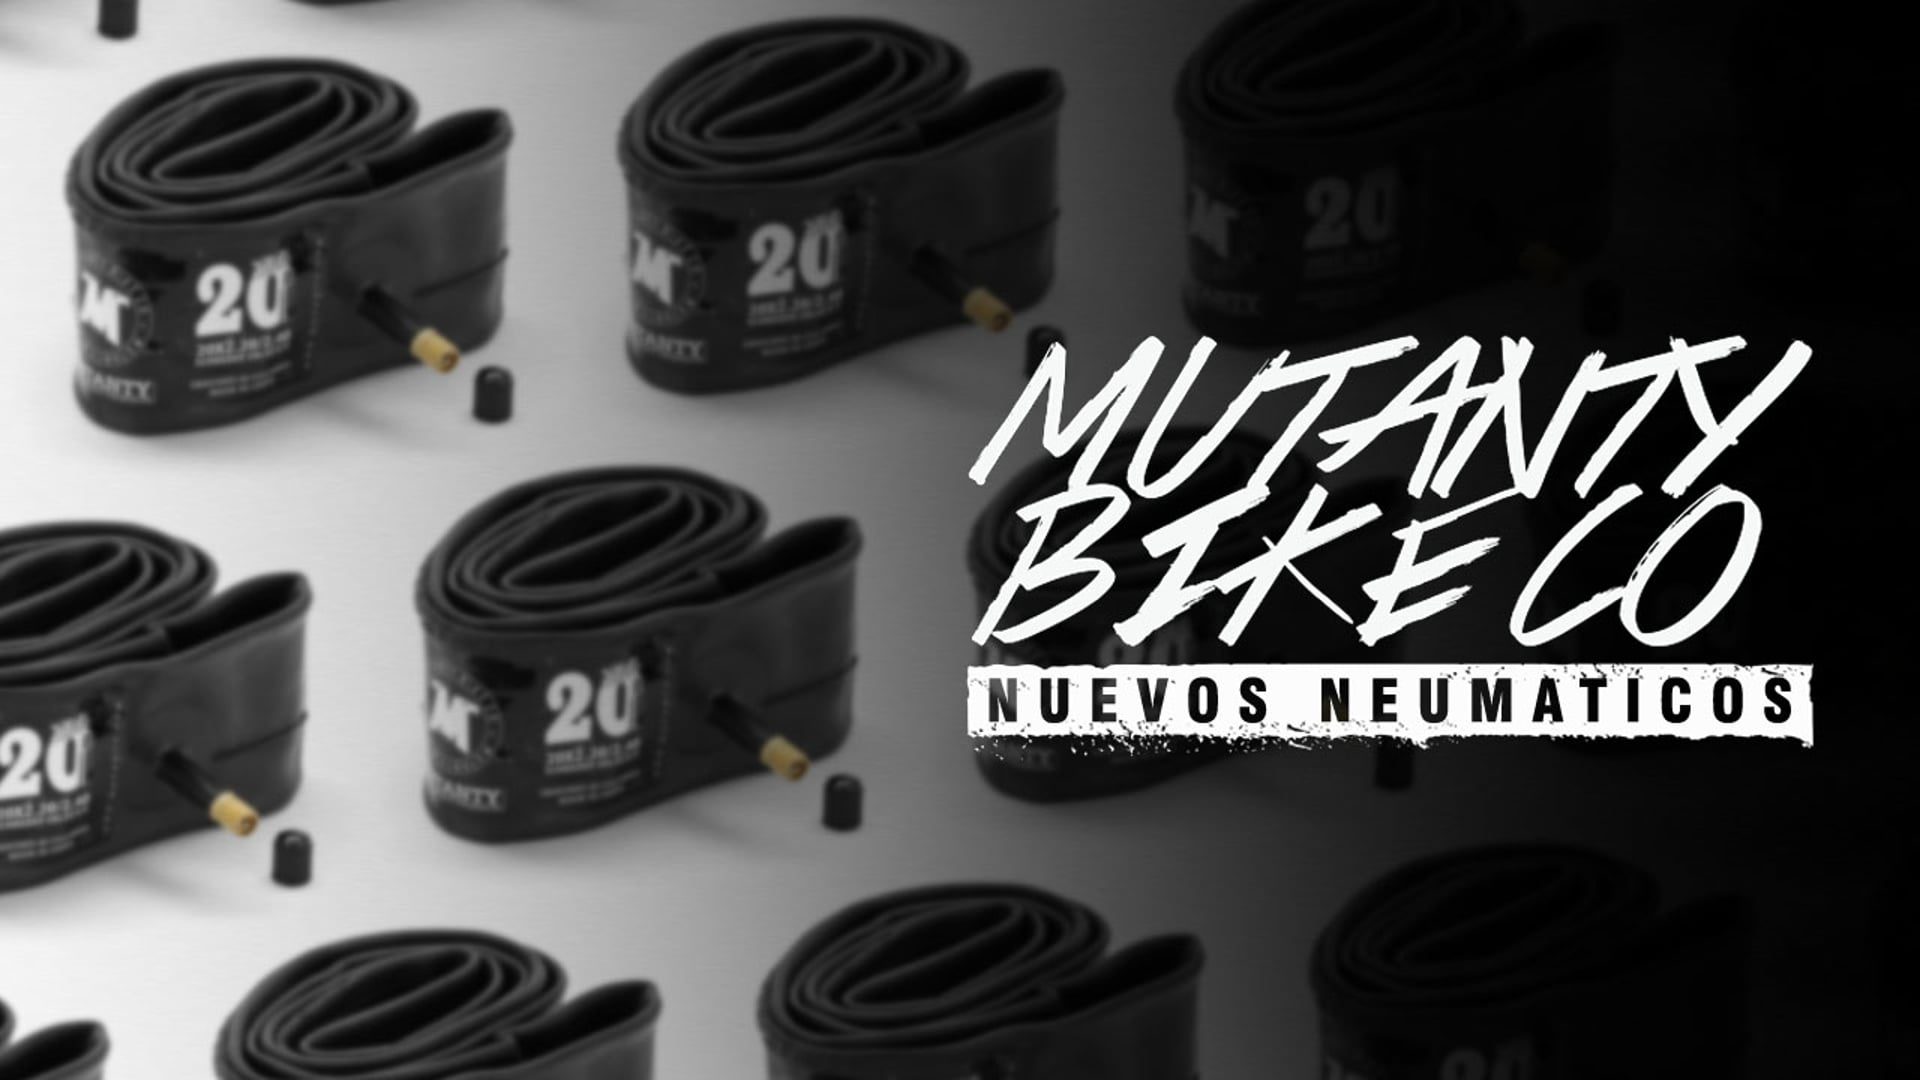 "NUEVOS NEUMÁTICOS MUTANTY 2.40"""